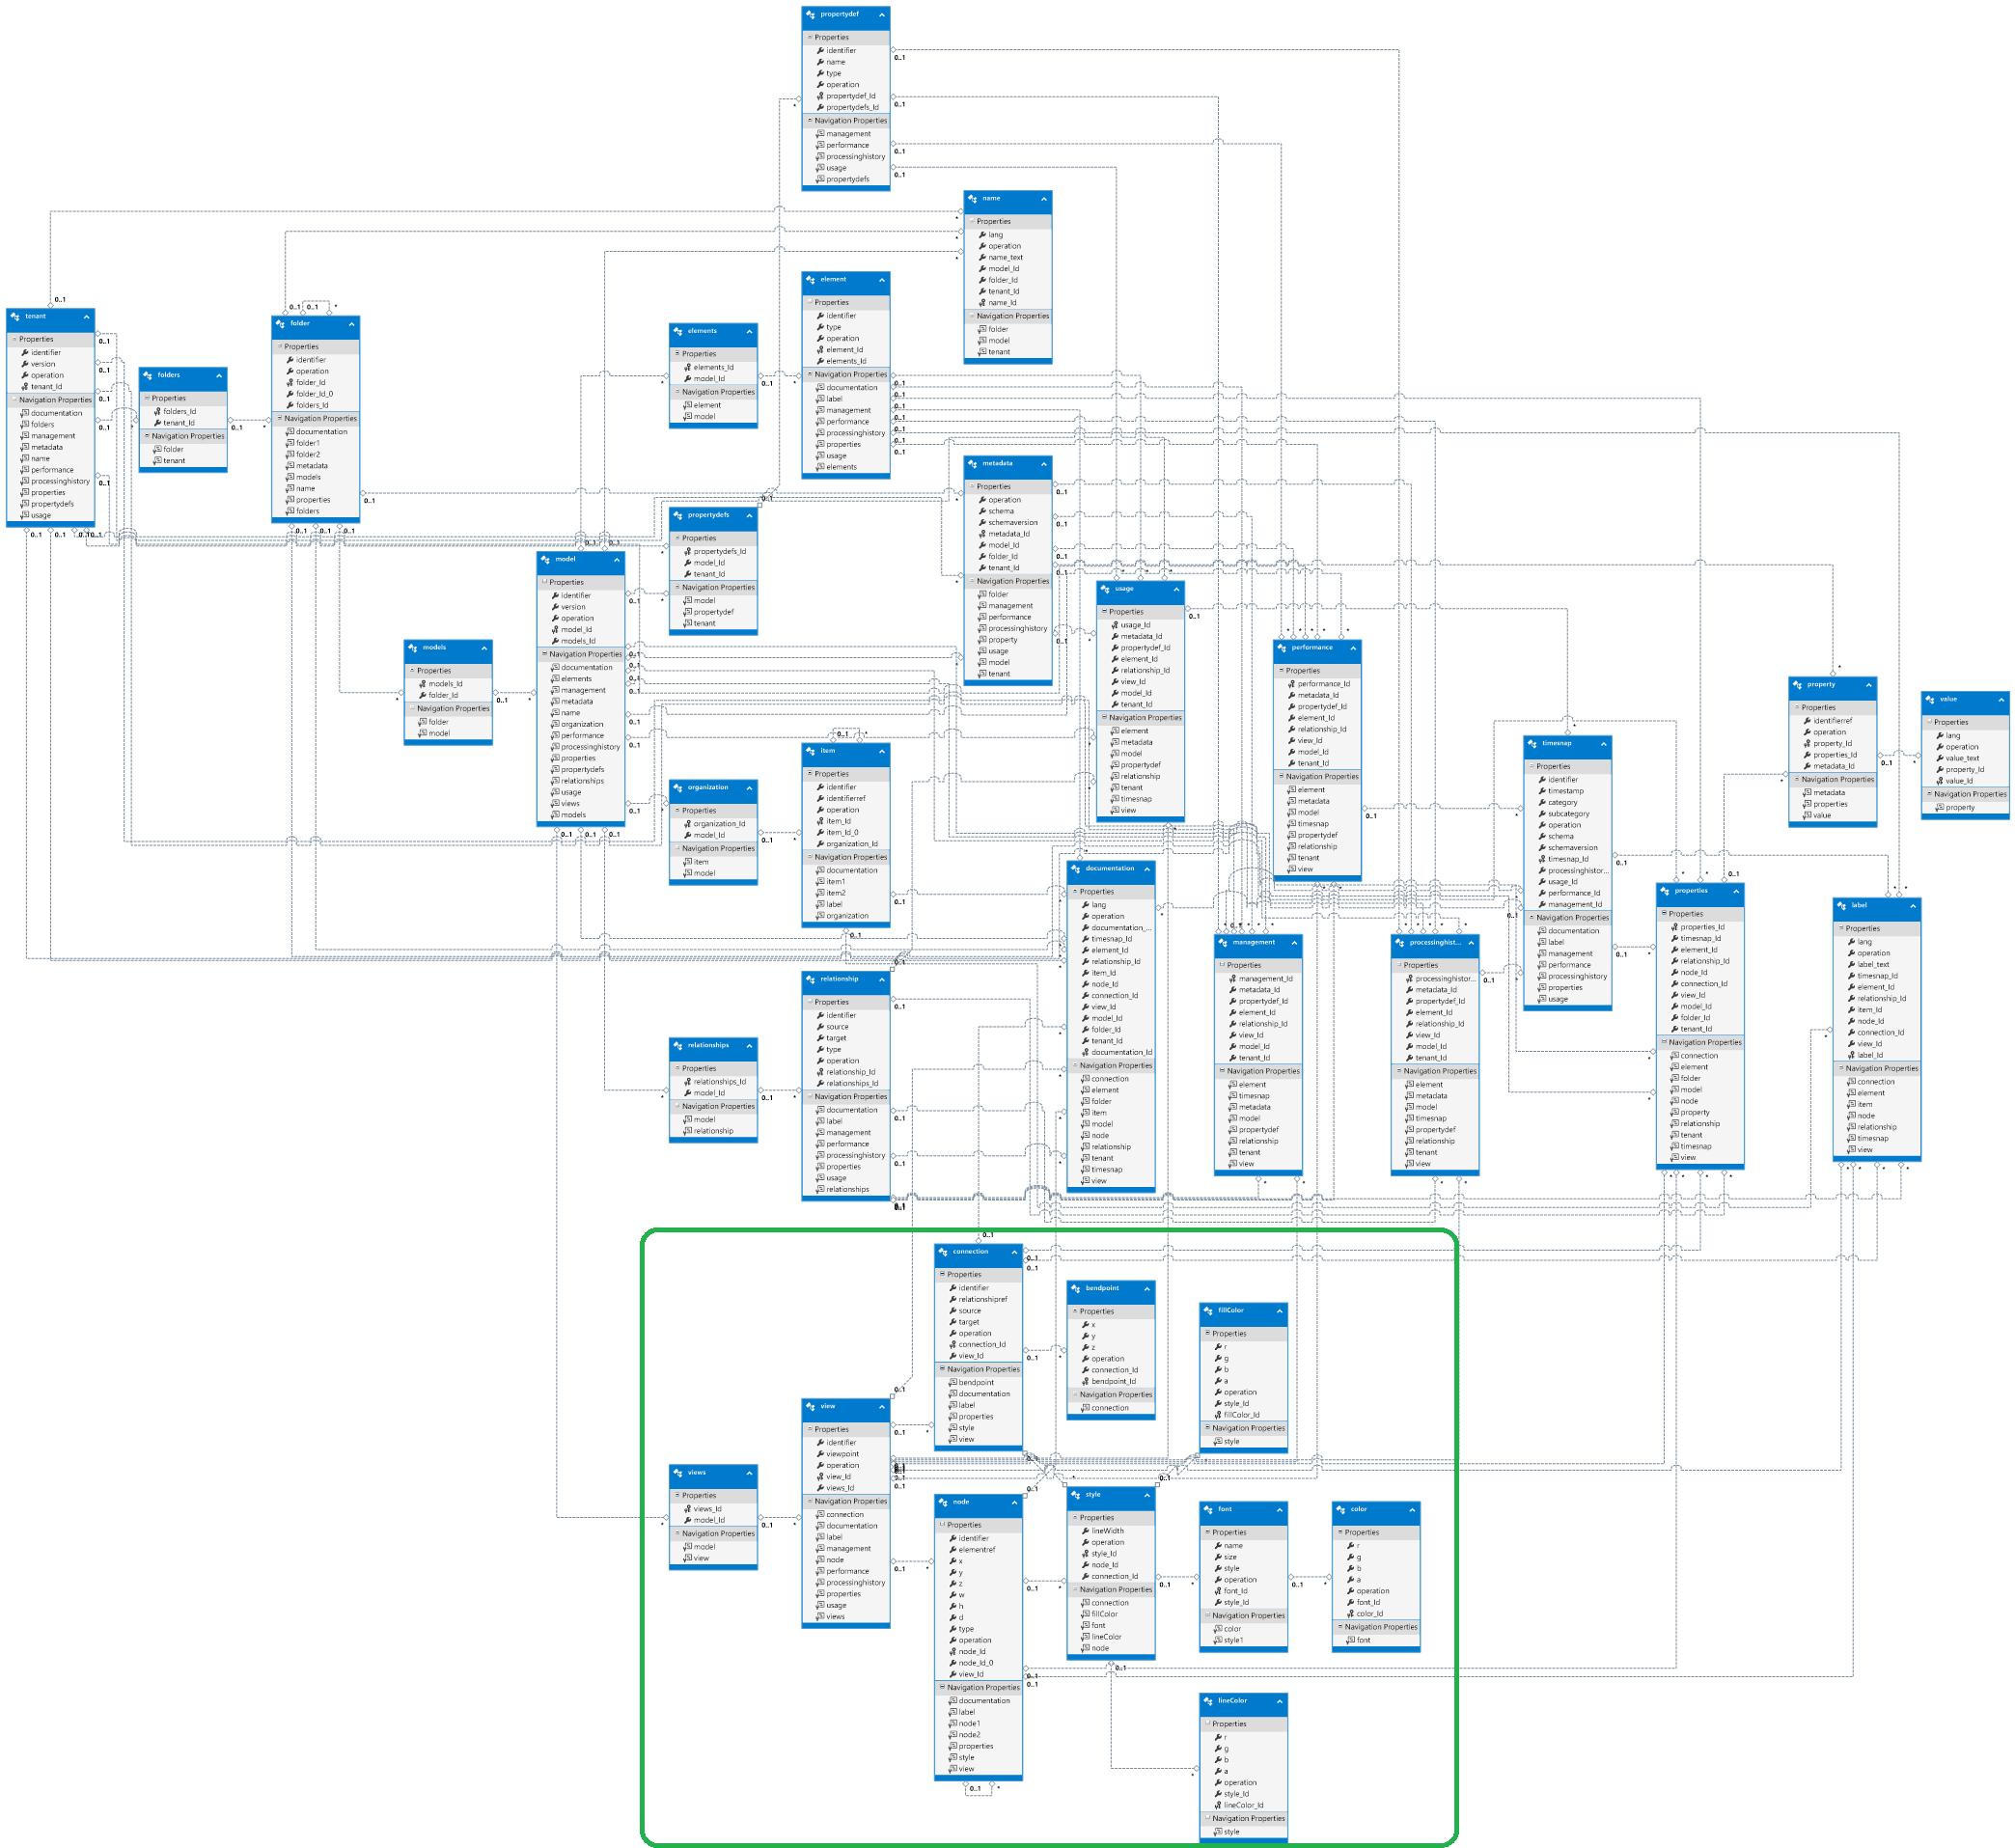 Servicenow cmdb data model pdf